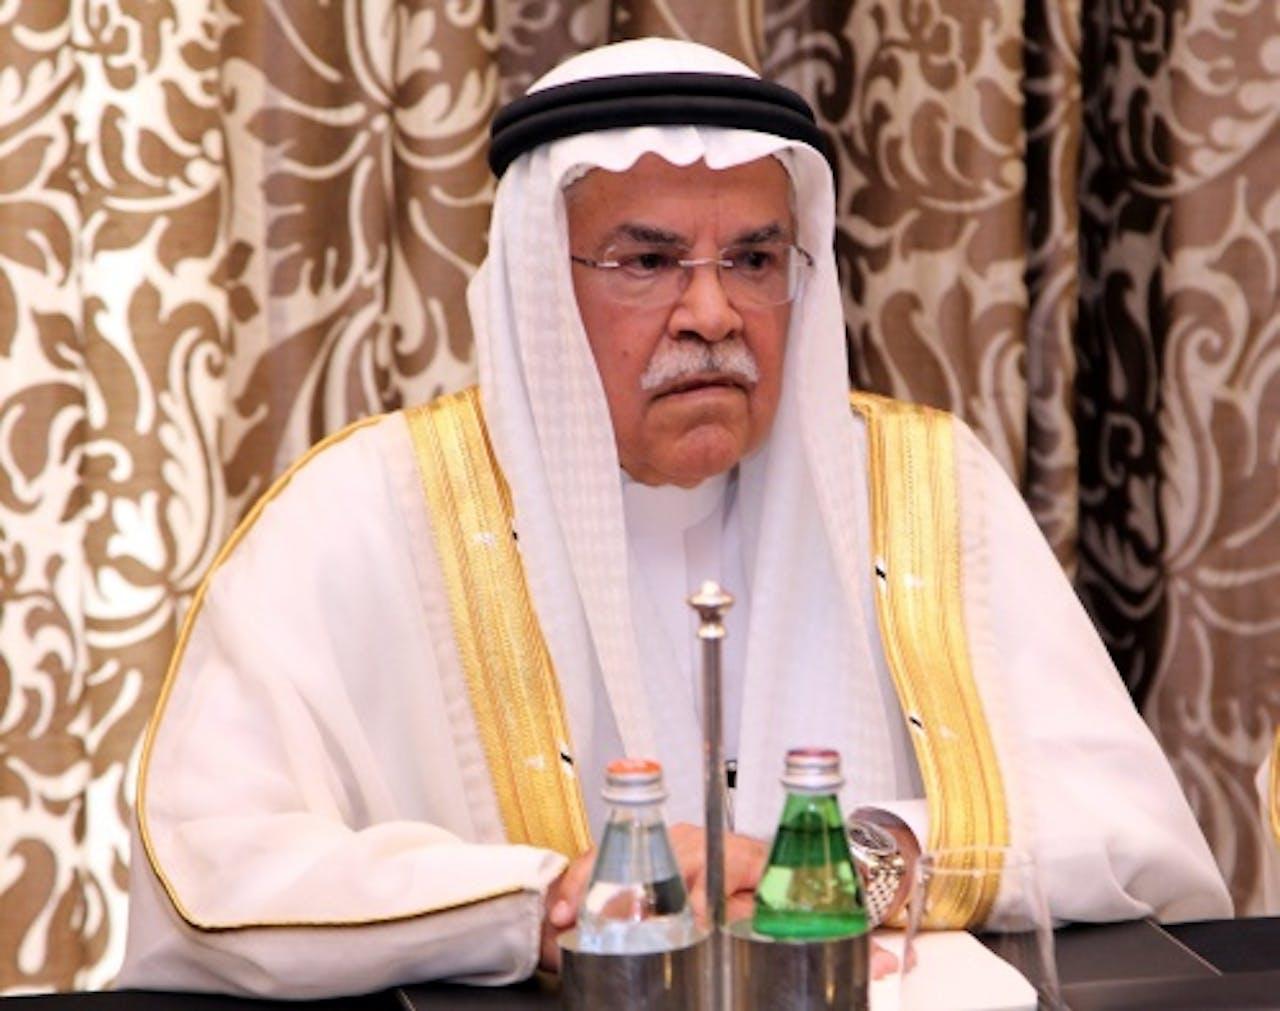 Voormalig minister Ali al-Naimi. EPA